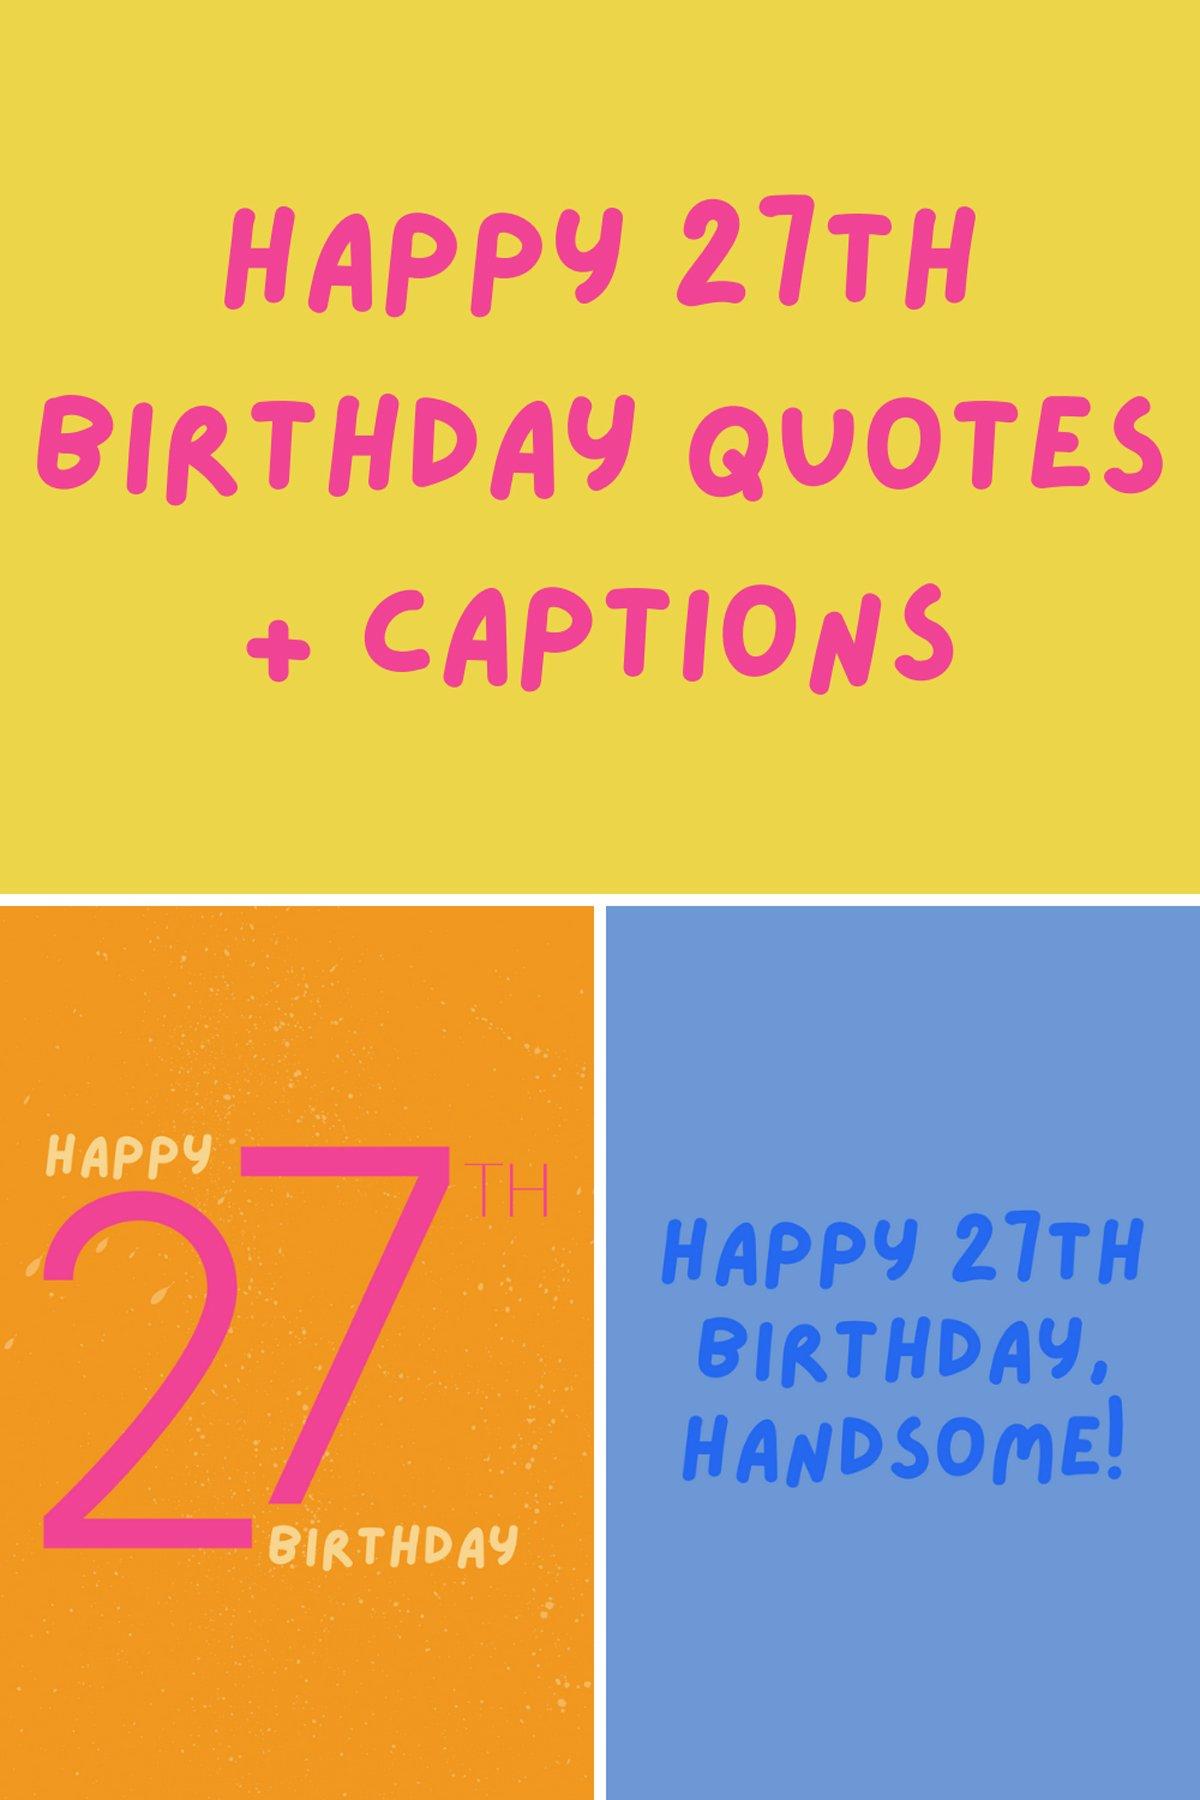 27th Birthday Quotes Captions